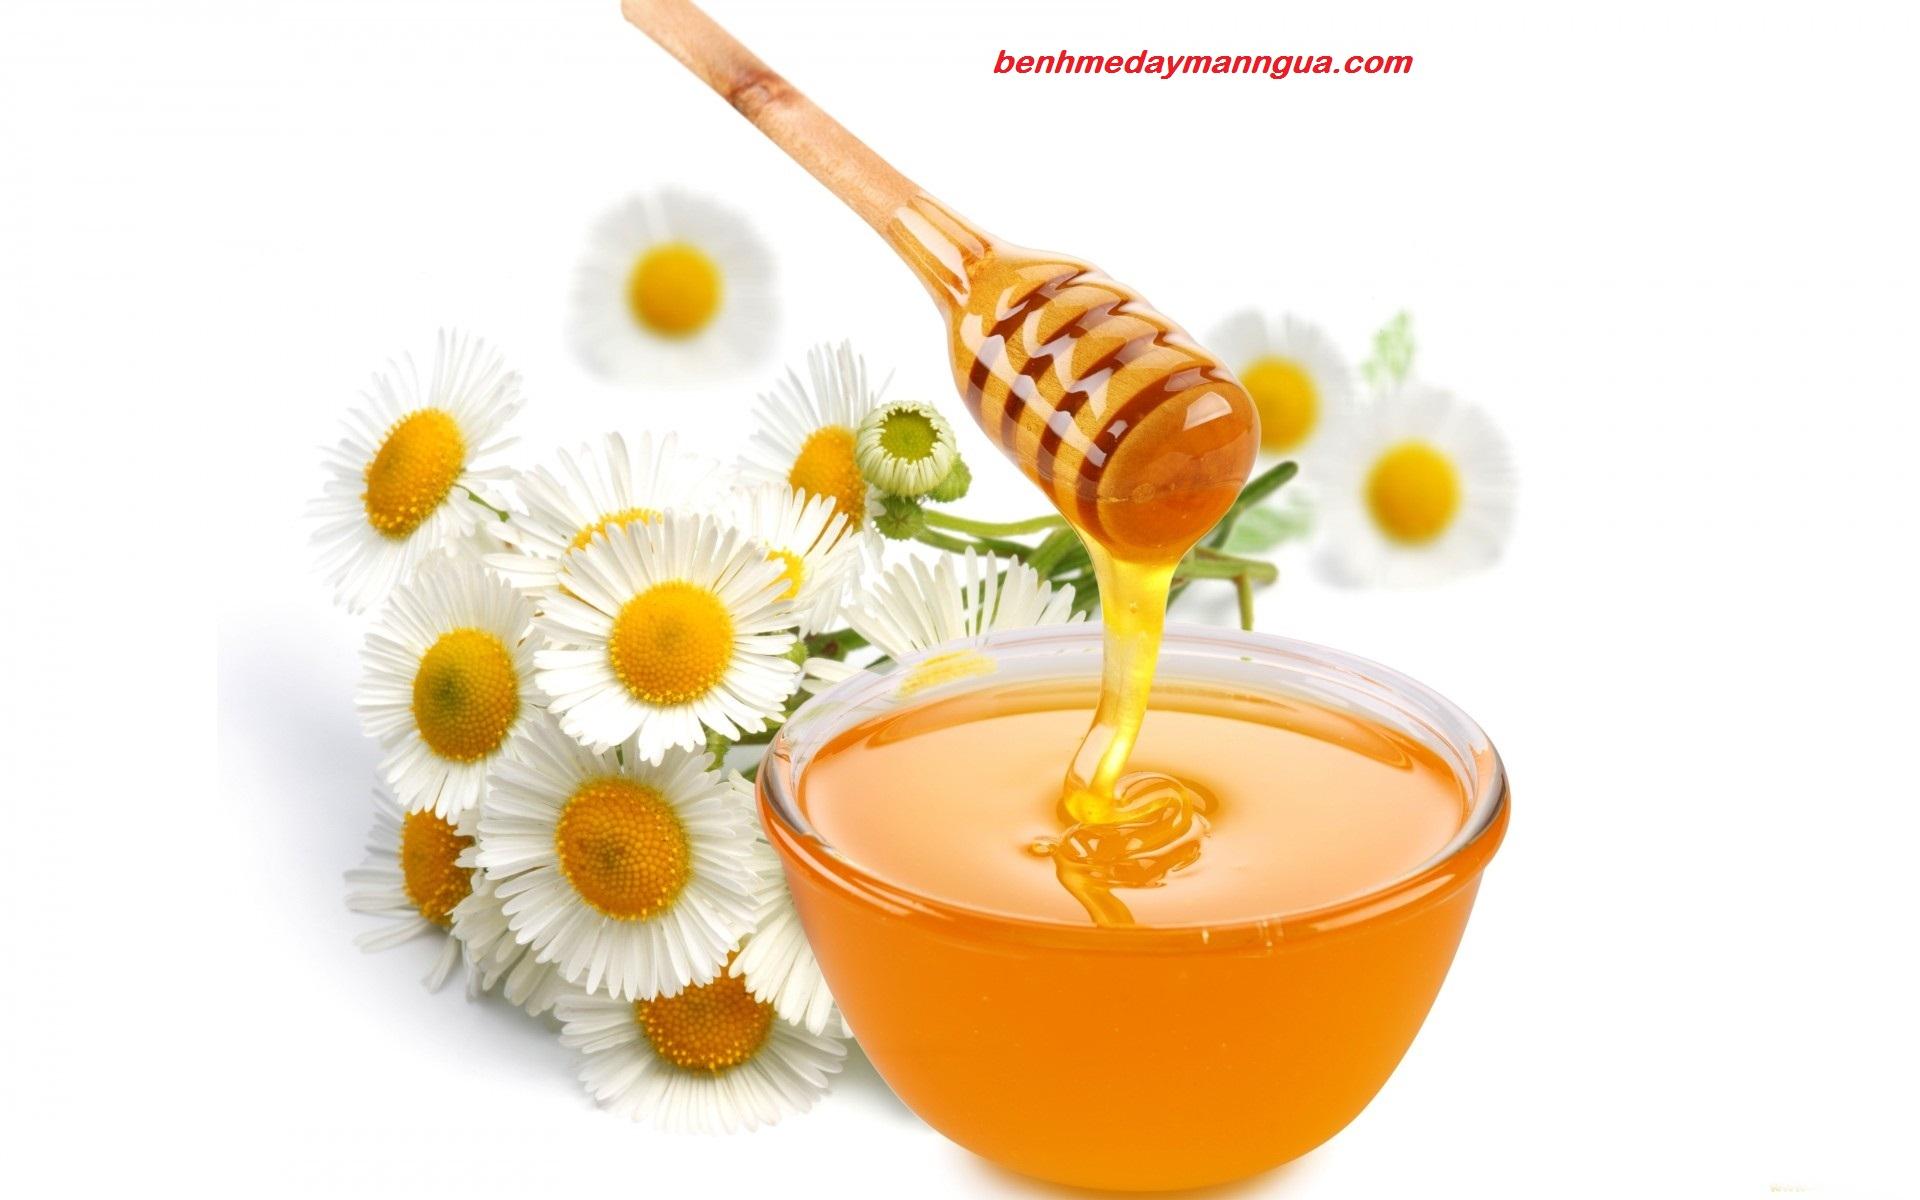 cach-chua-benh-di-ung-thoi-tiet-don-gian-bang-meo (5)